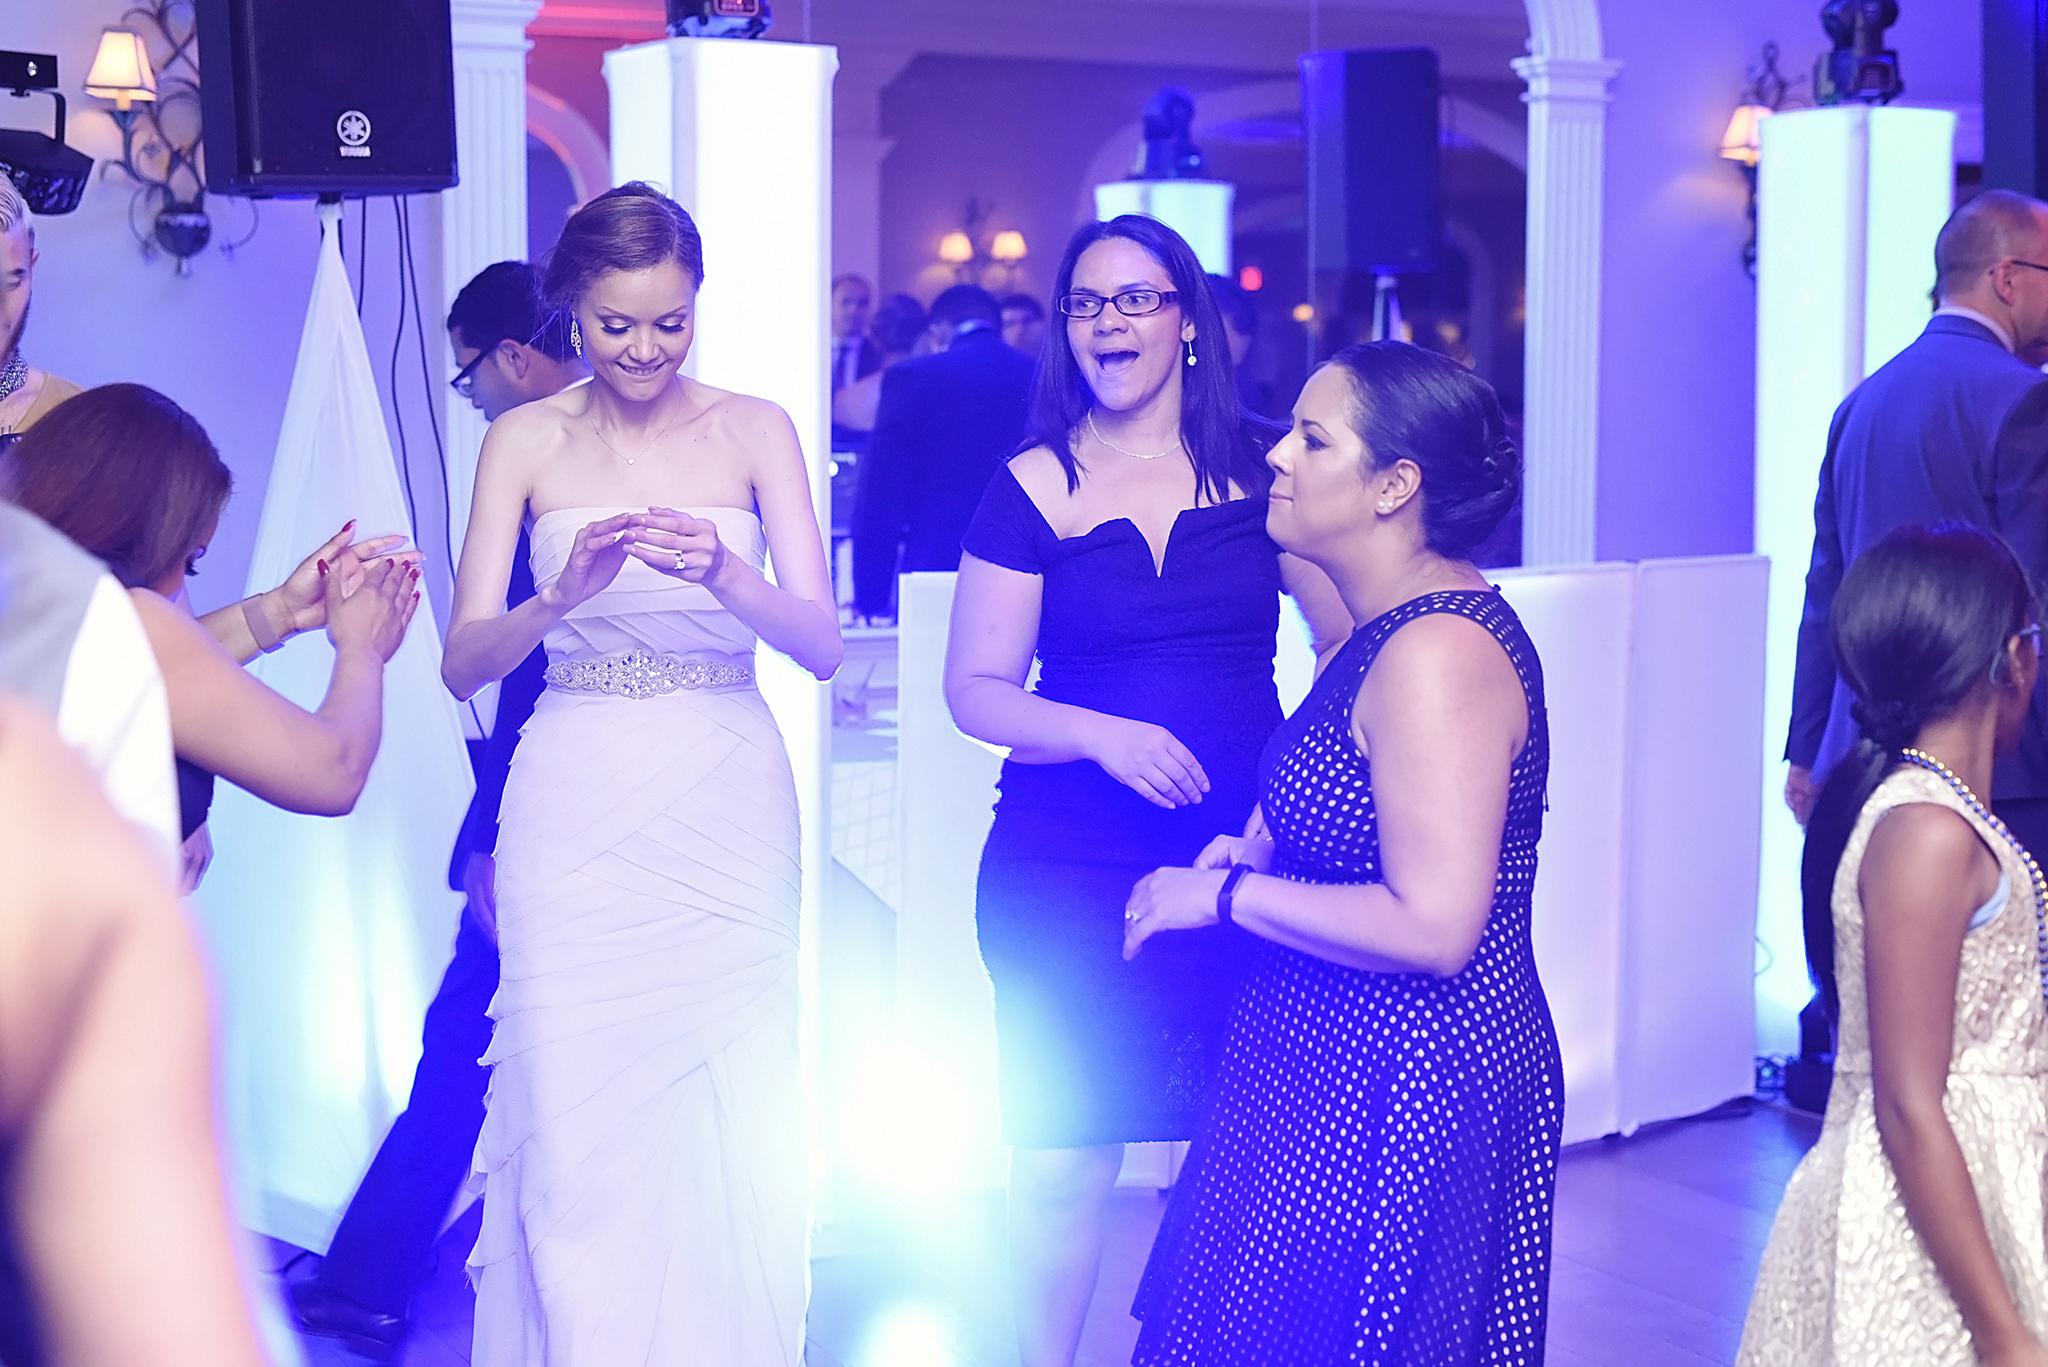 NJ-NY-wedding-photographer-166NJ-NY-wedding-photographer-166NJ-NY-WEDDING-PHOTOGRAPHER-166.JPG